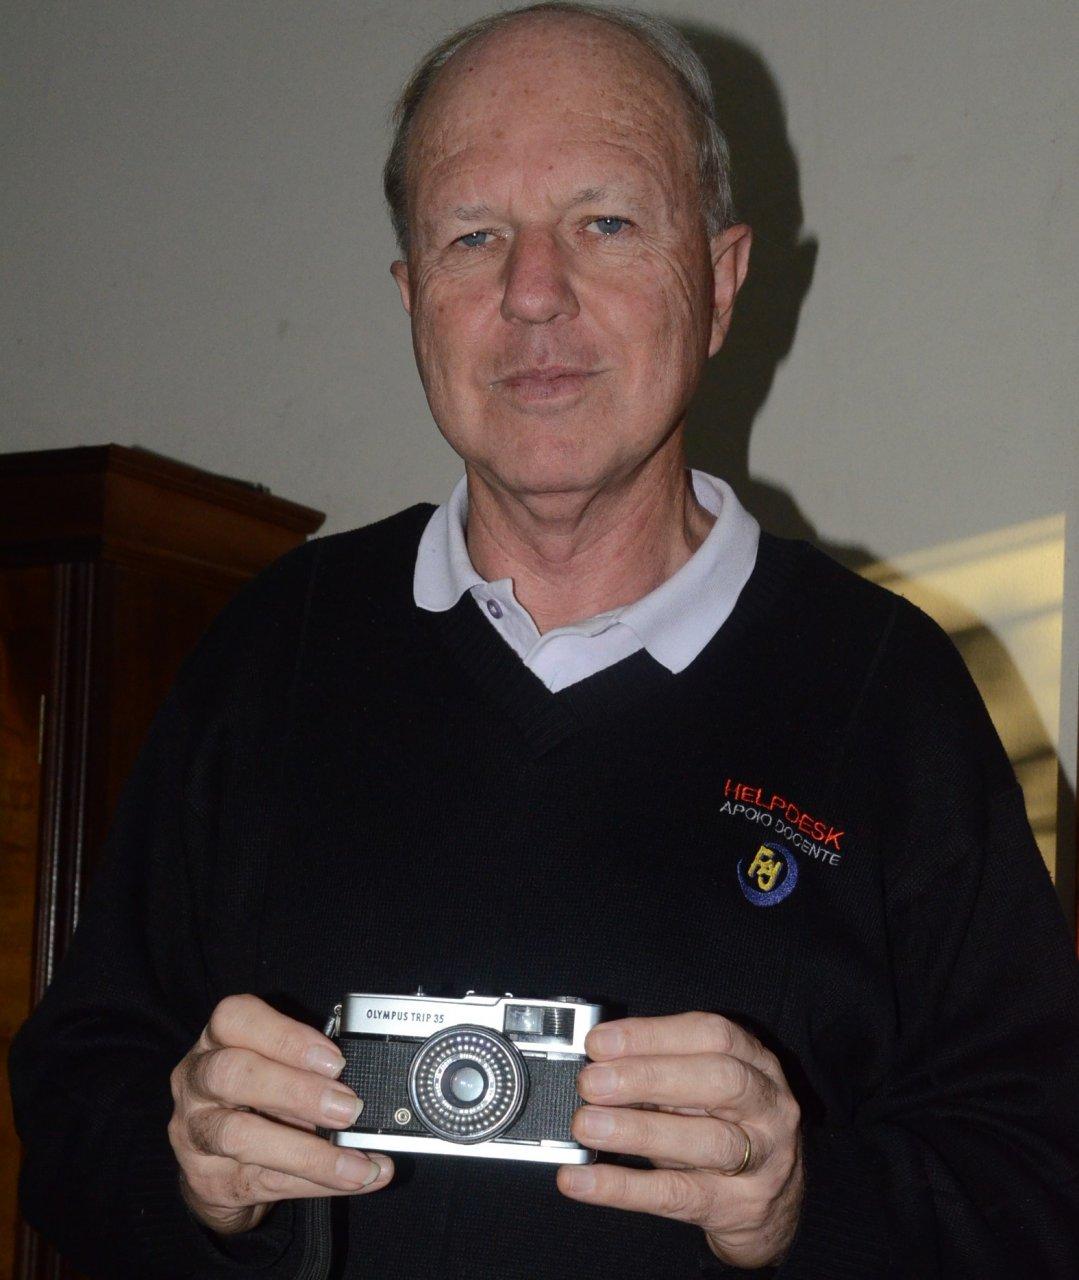 José Luís mostra a máquina fotográfica que registrou diversos momentos